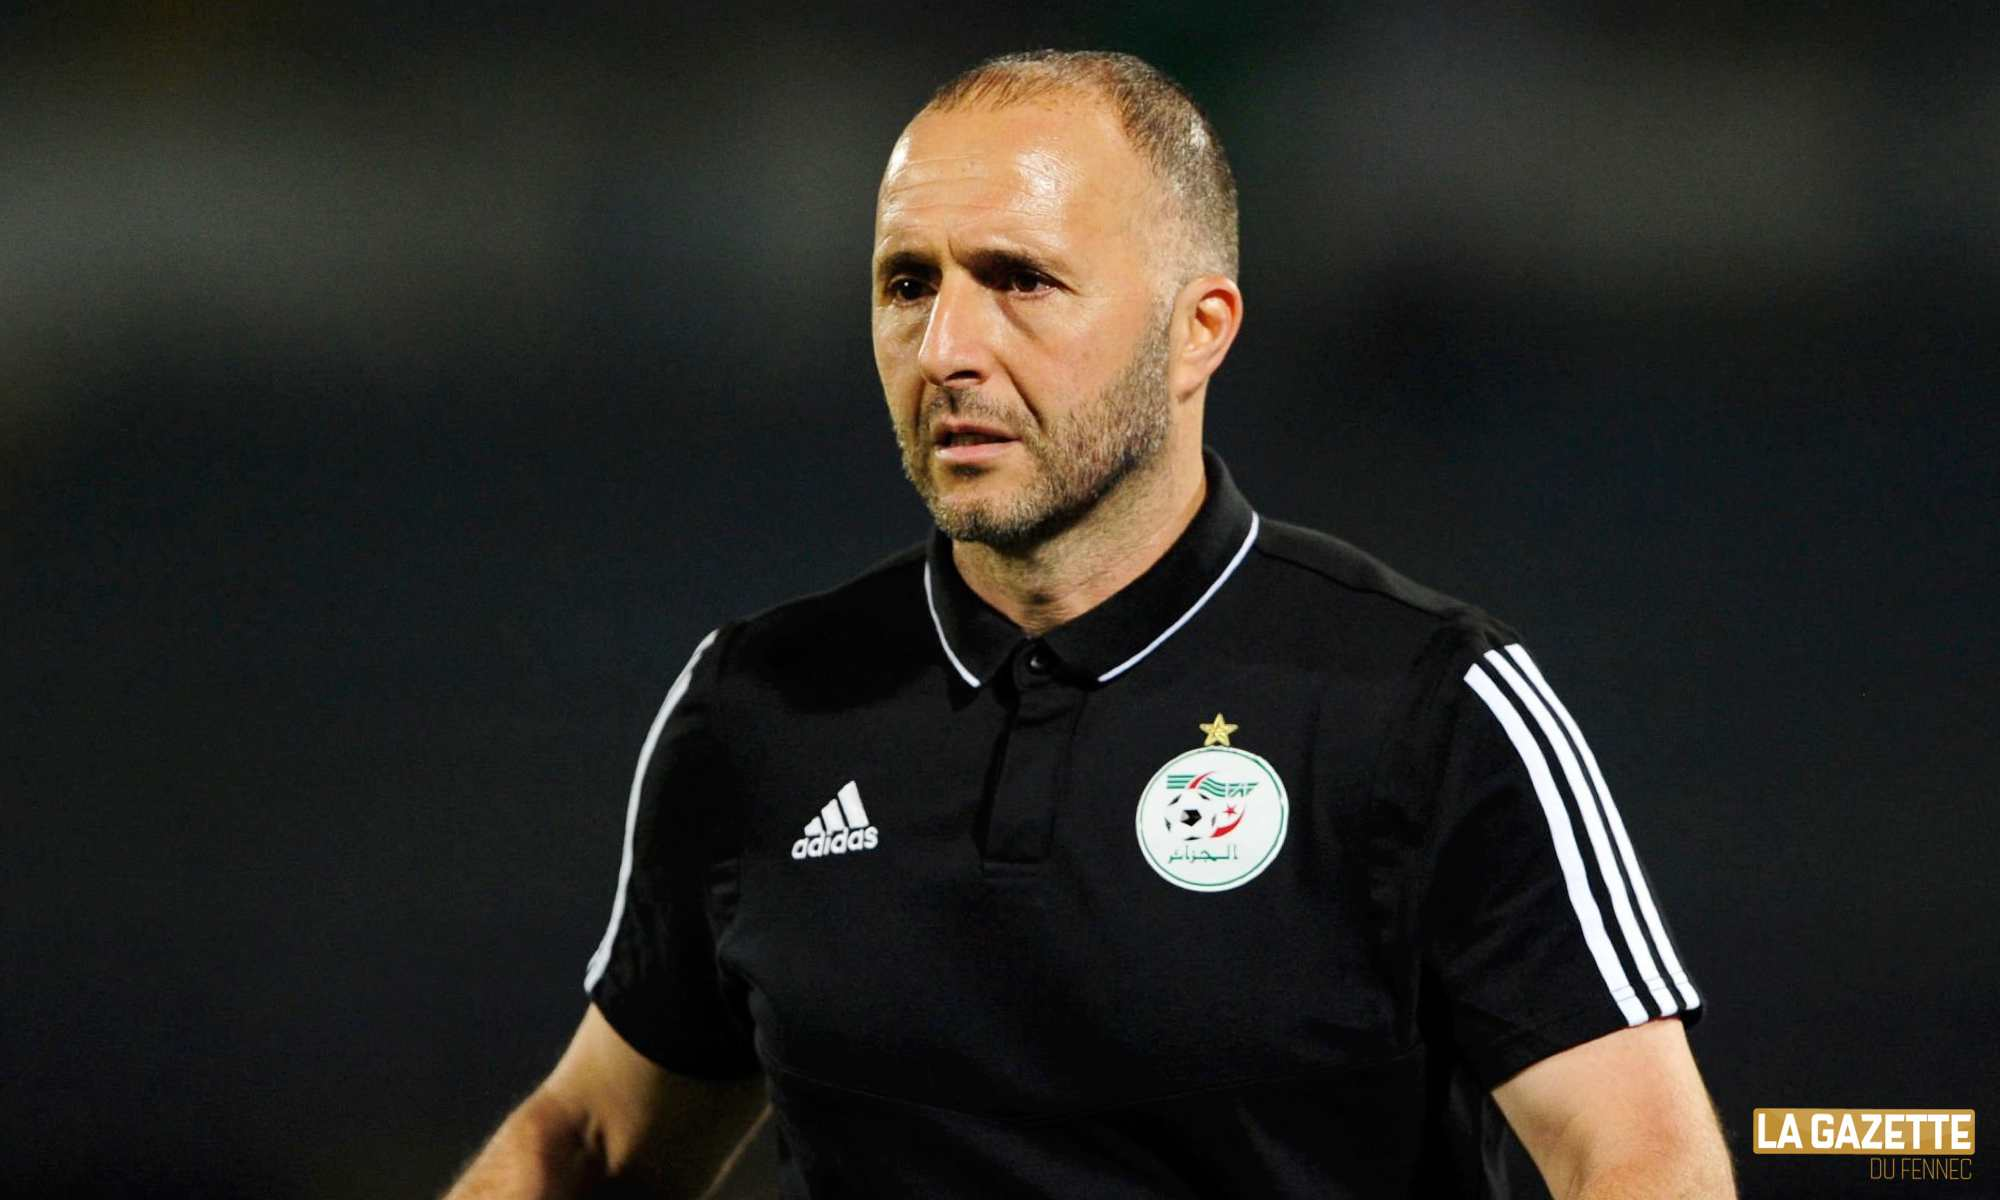 djamel belmadi black can 2019 coach